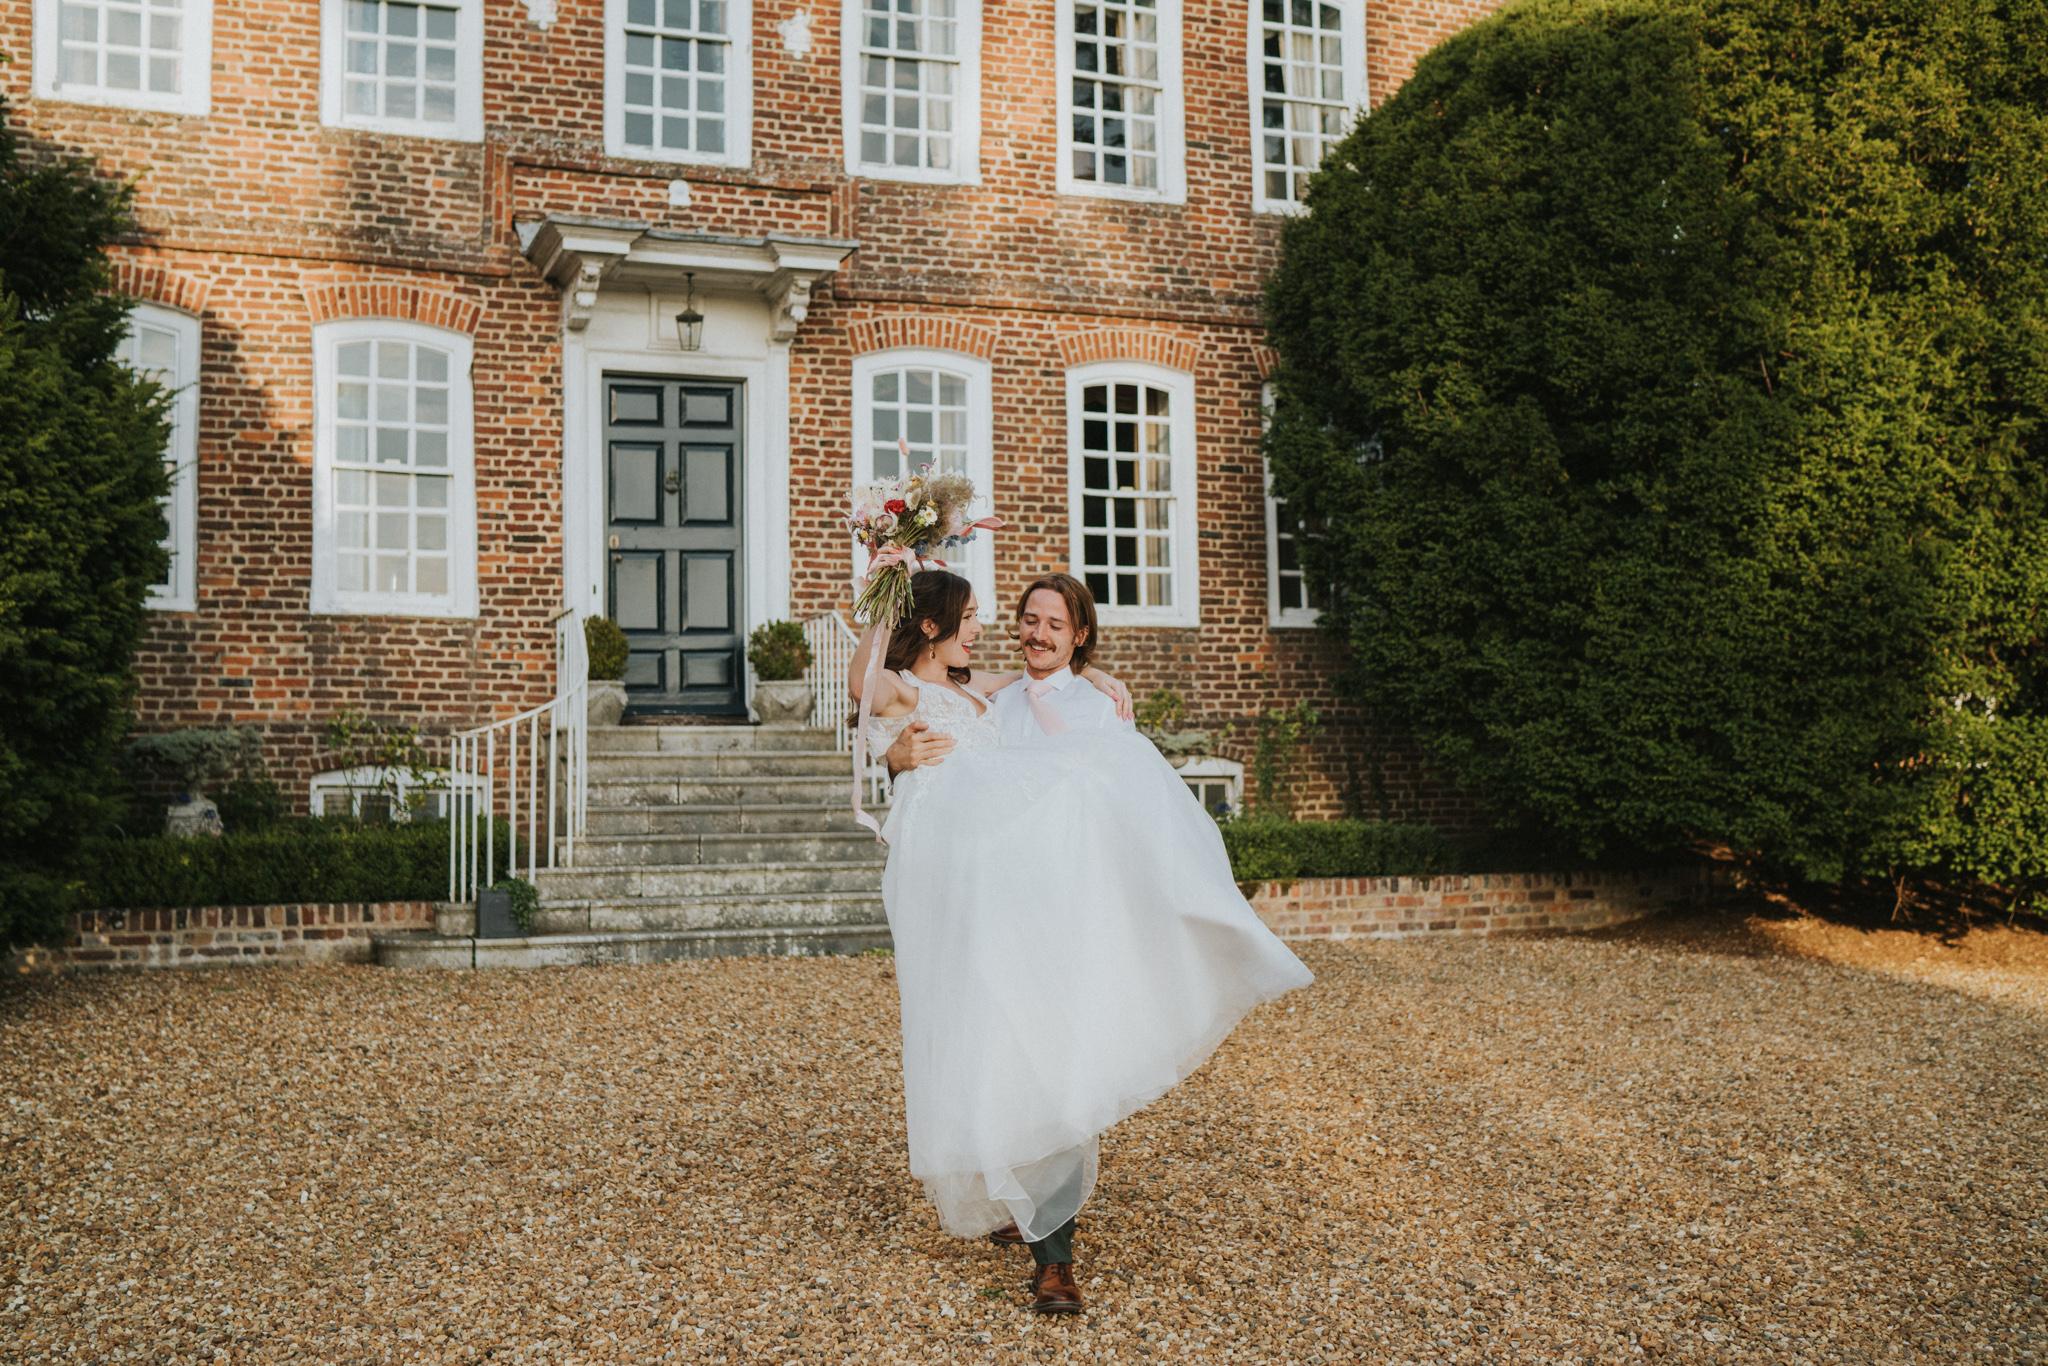 emi-Jack-boho-diy-wedding-eggington-house-grace-elizabeth-colchester-essex-alternative-wedding-photographer-suffolk-norfolk-devon (46 of 56).jpg